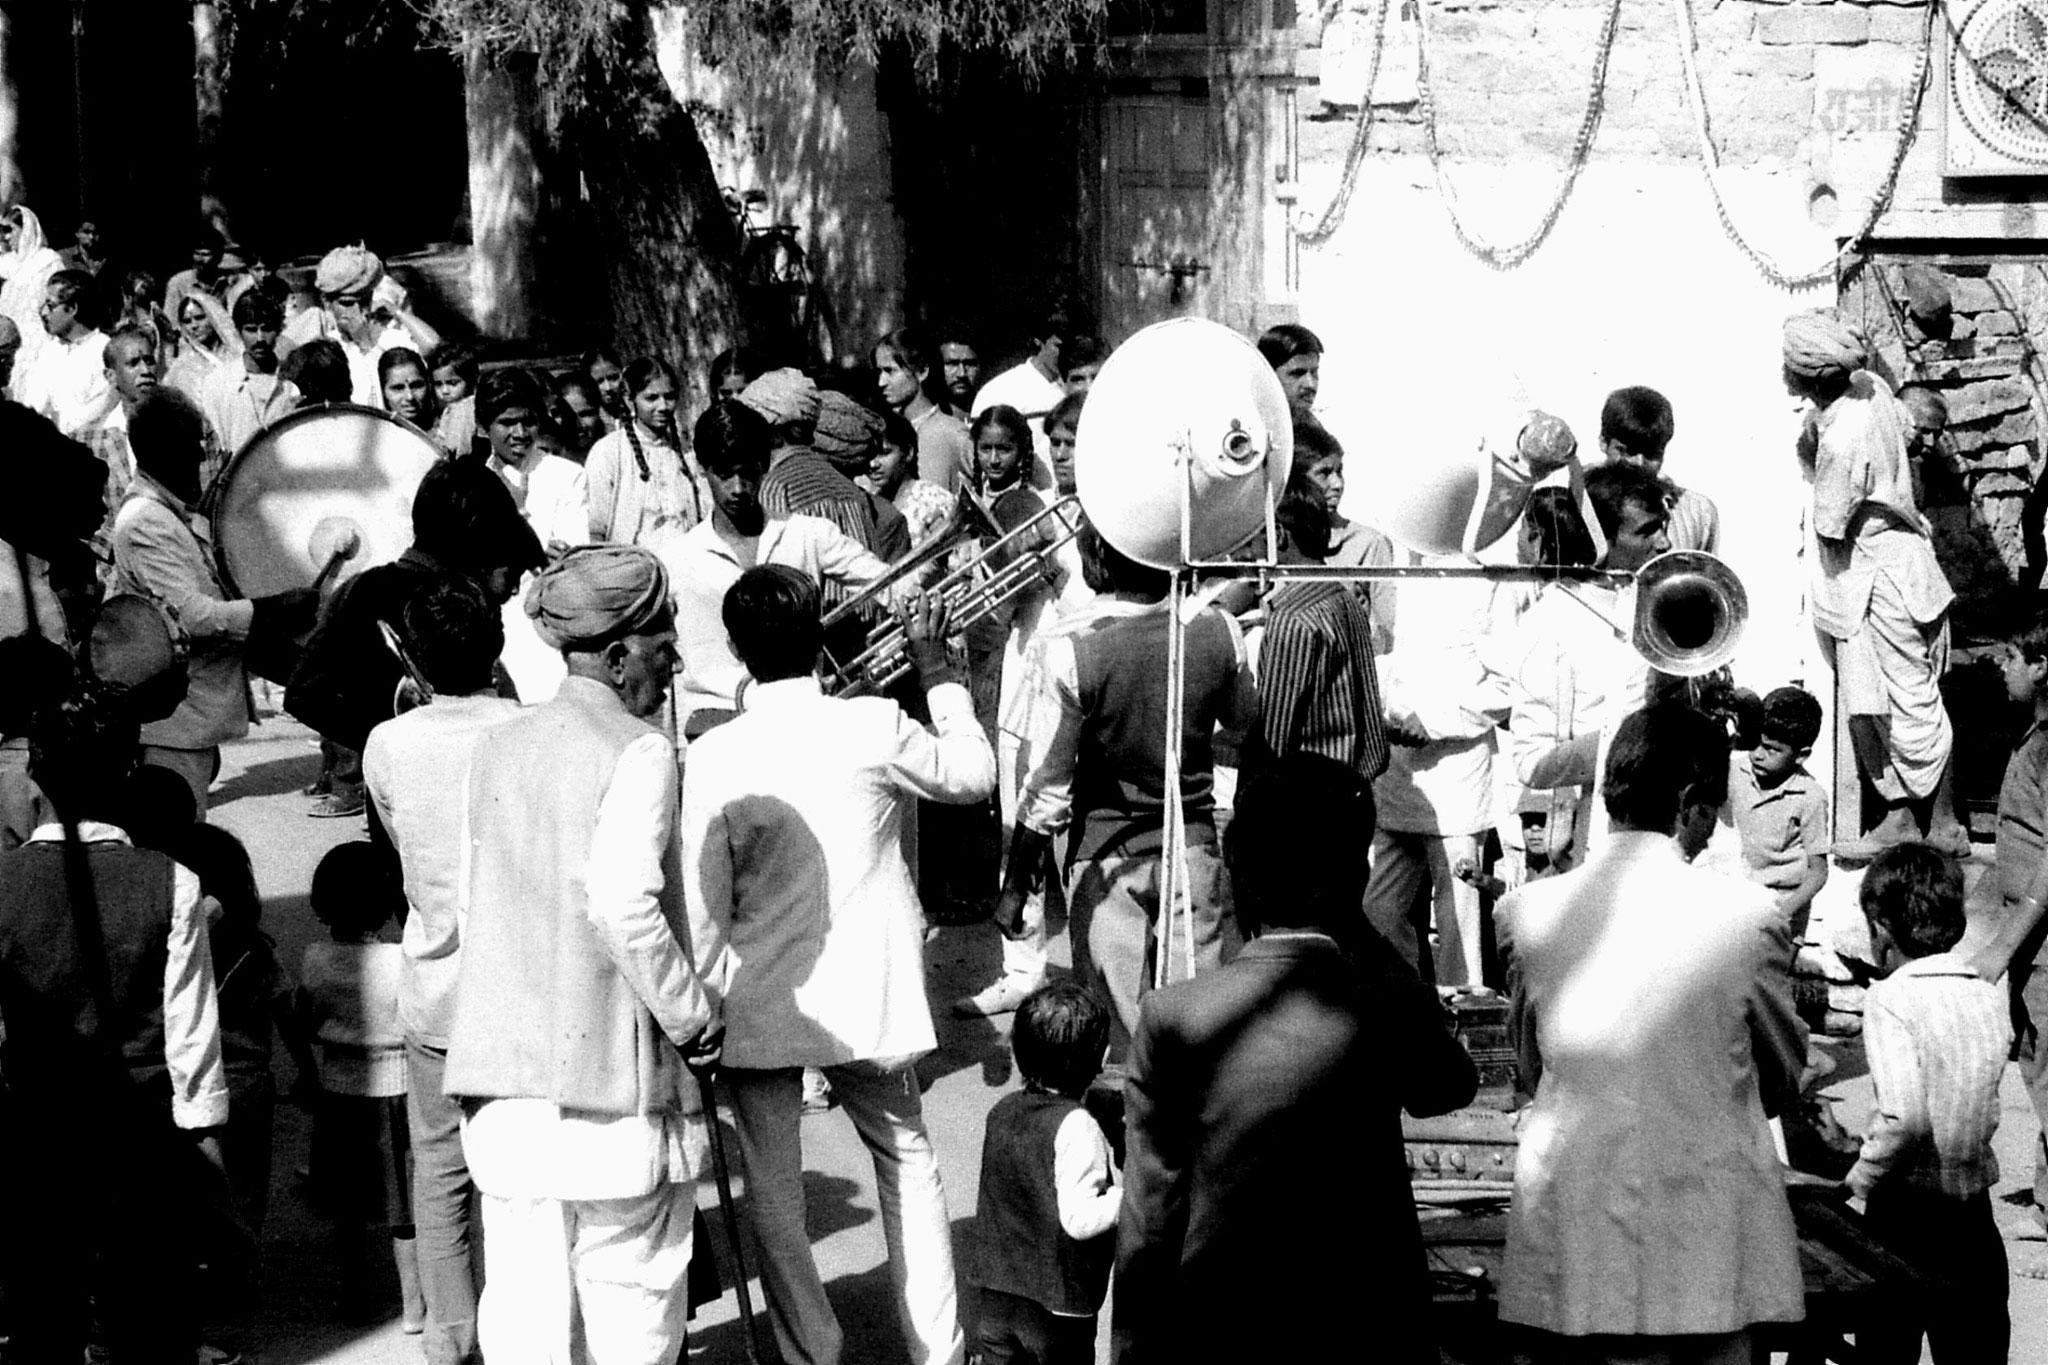 3/12/1989: 31: Jaisalmer wedding band